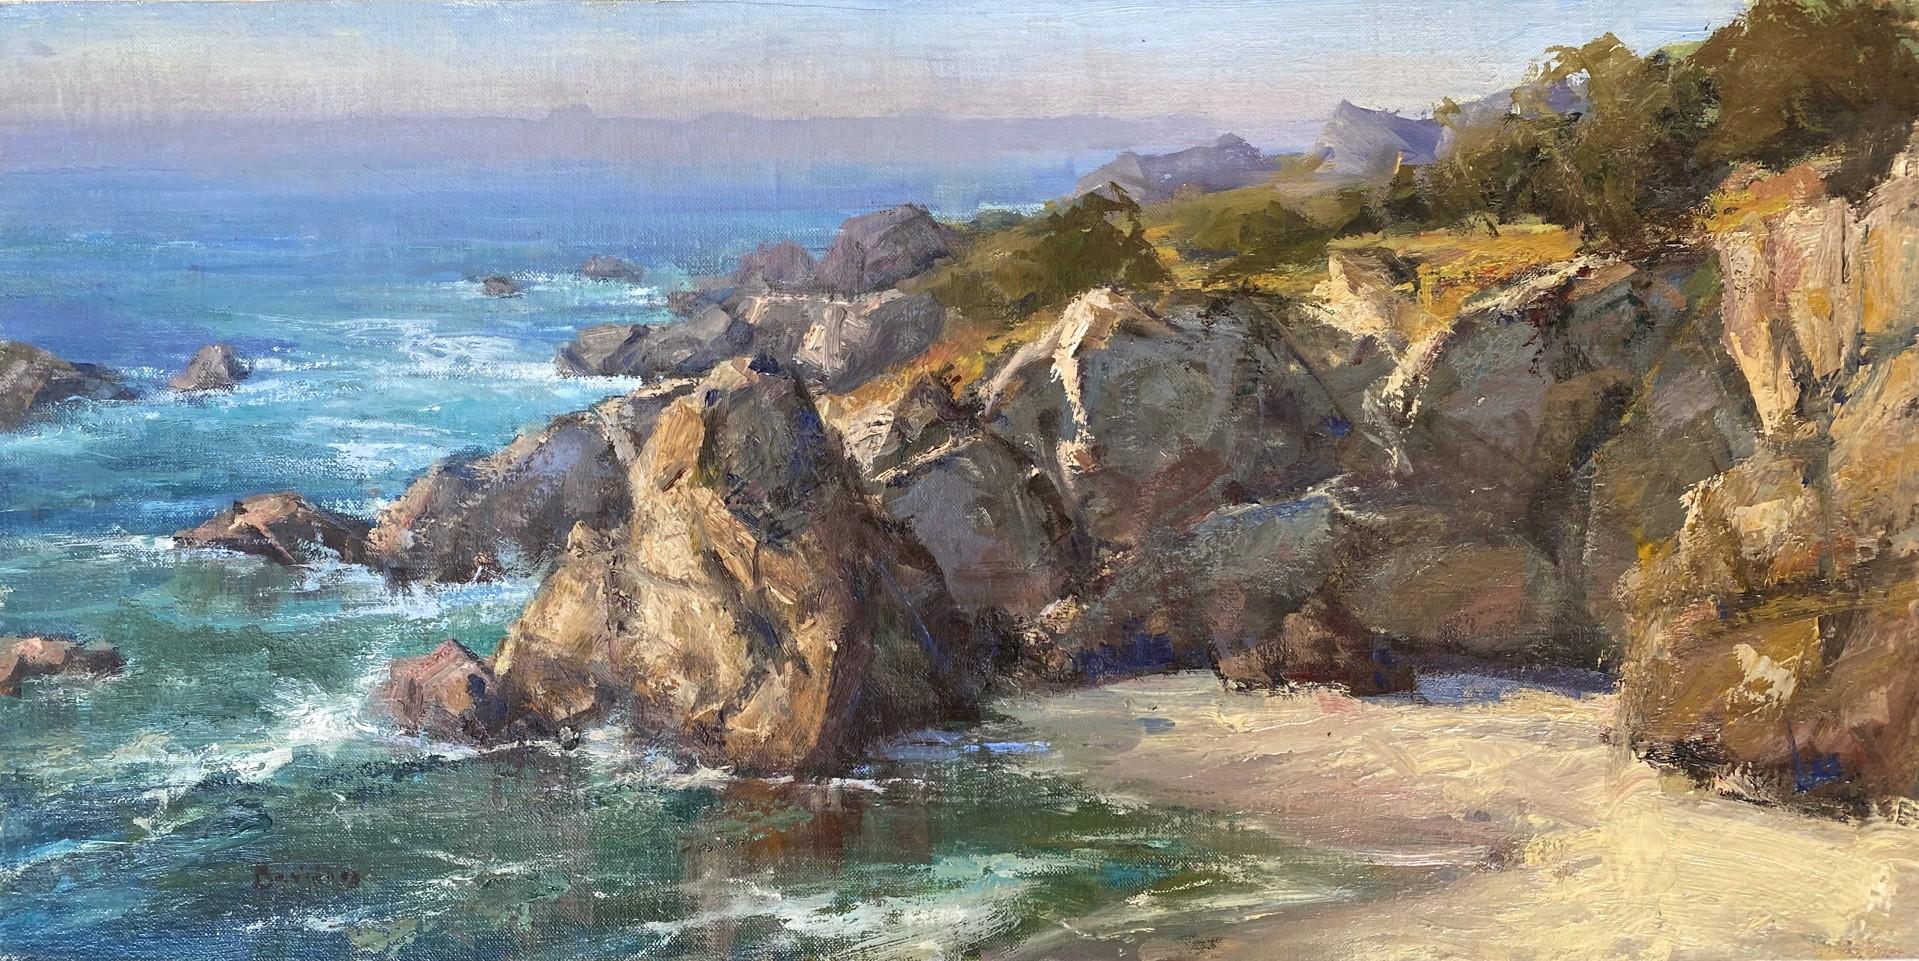 California Cadence by Bill Davidson